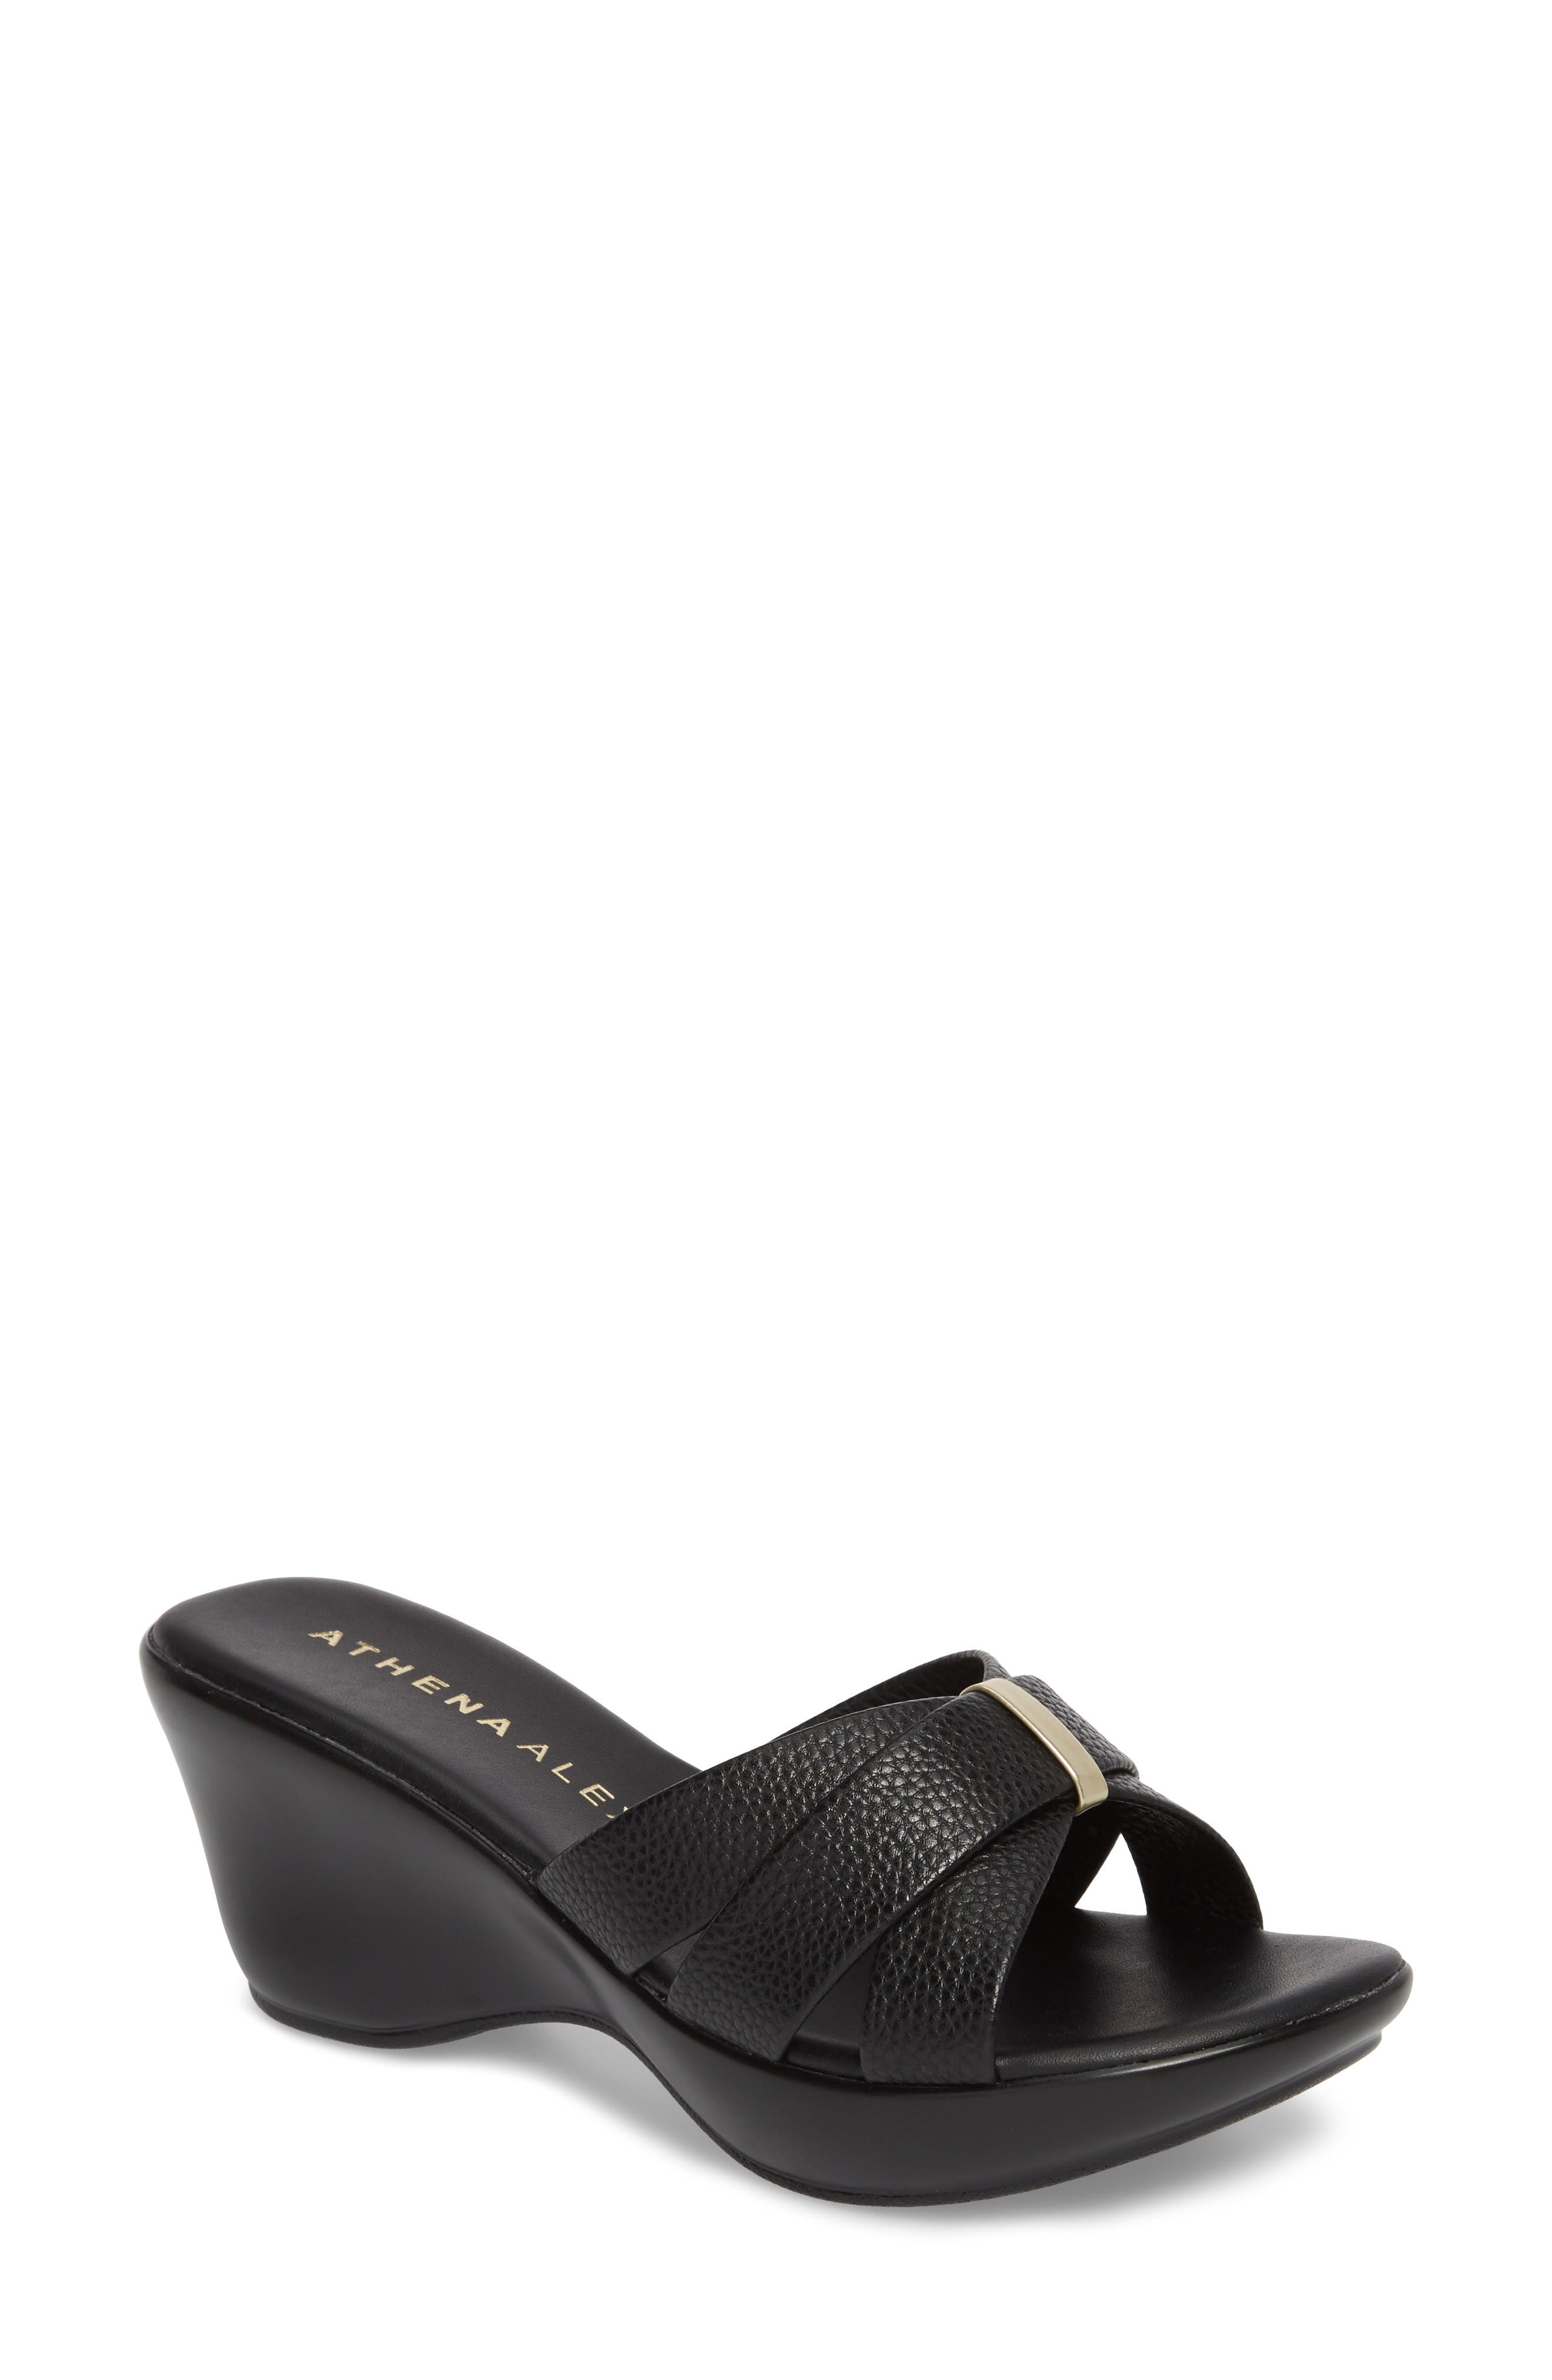 Athena Alexander Serra Wedge Slide Sandal (Women)